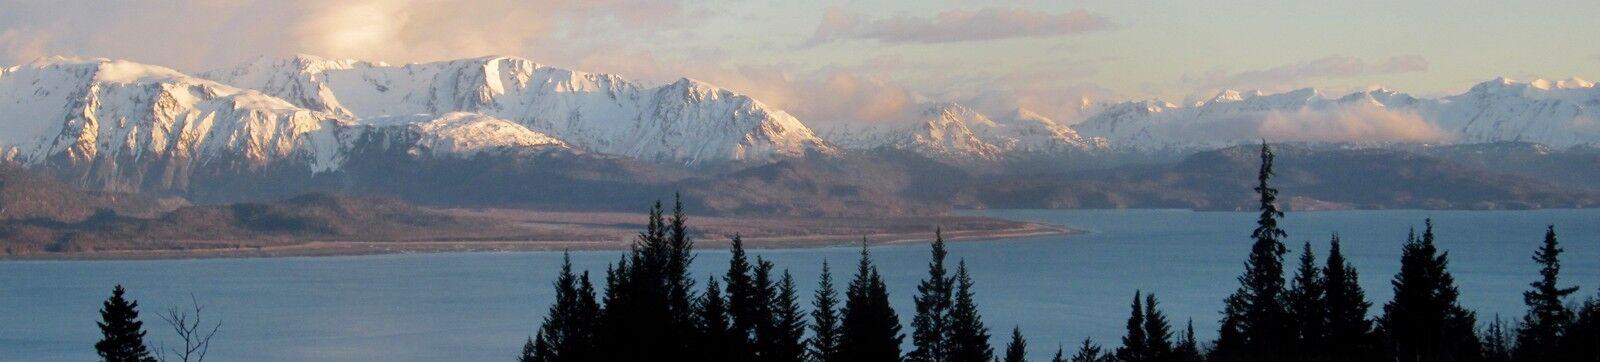 Alaska Gold Rush Mercantile